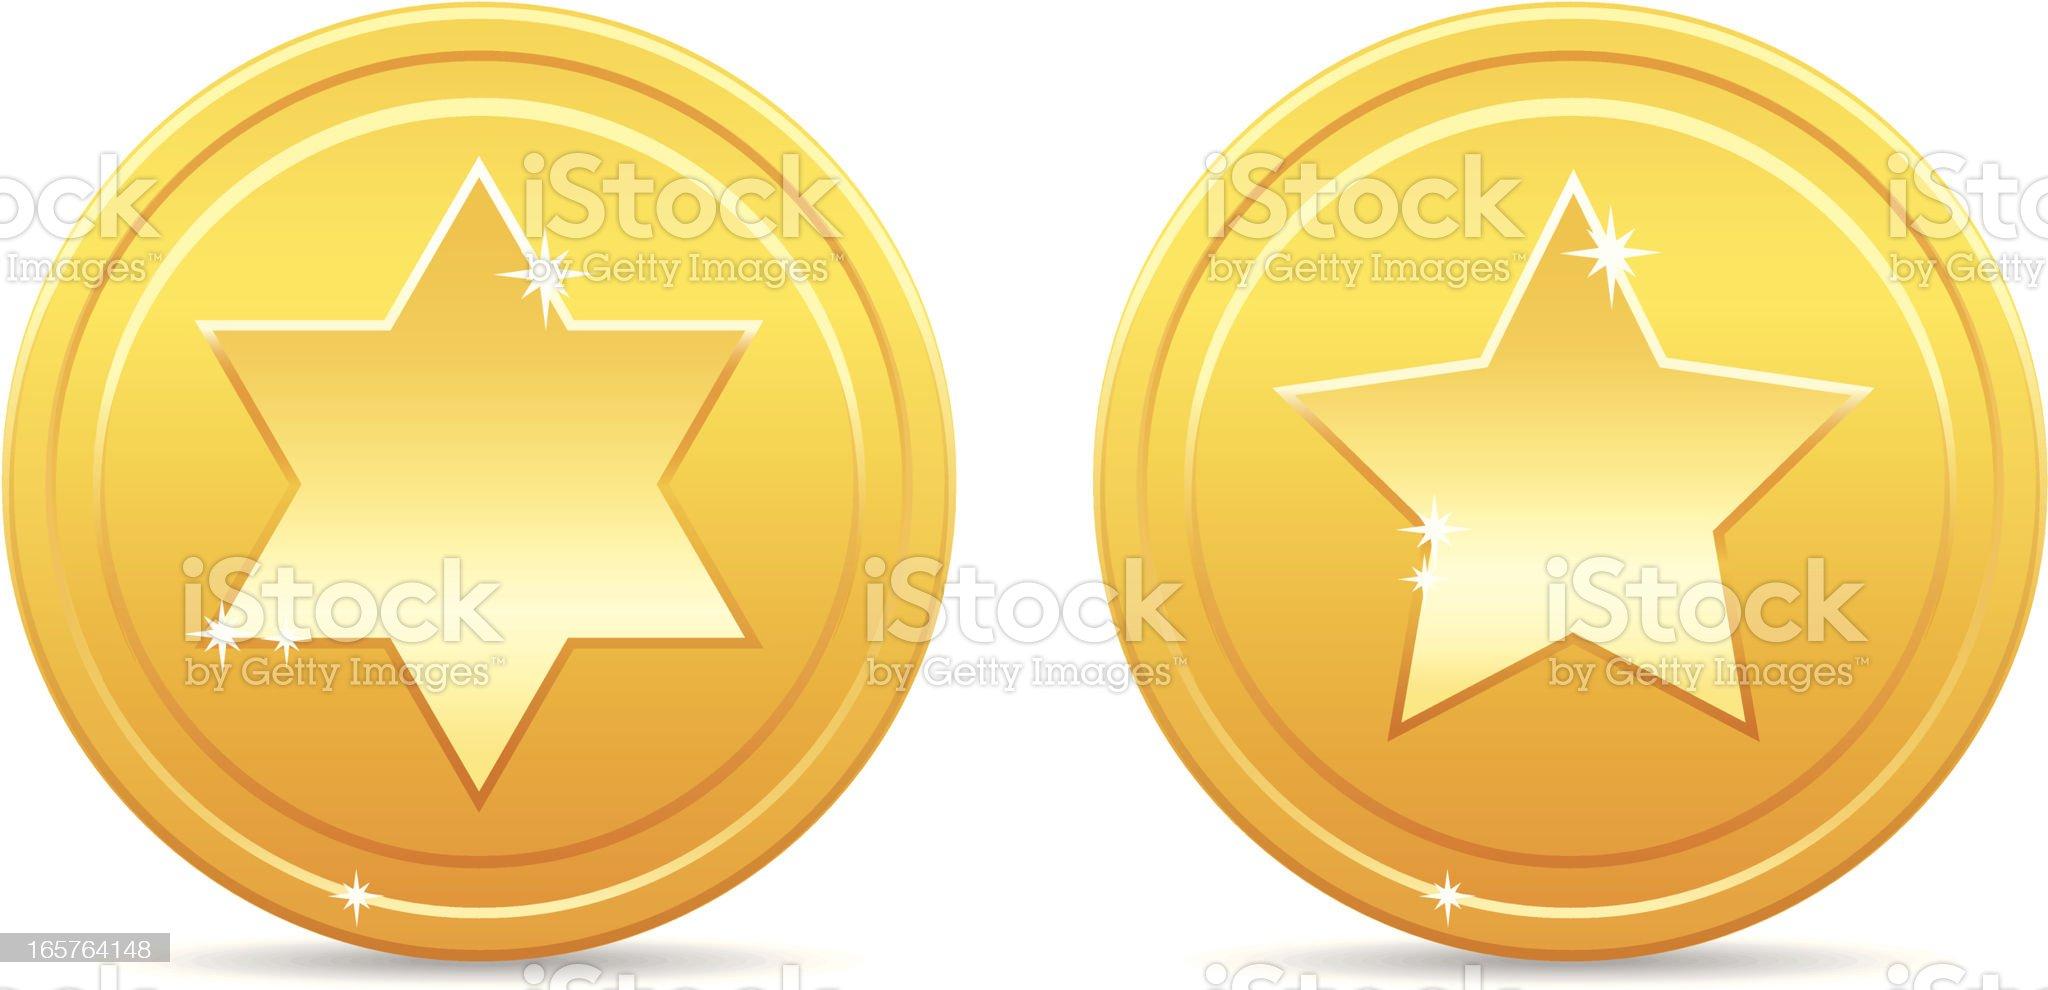 Shiny golden star coins royalty-free stock vector art